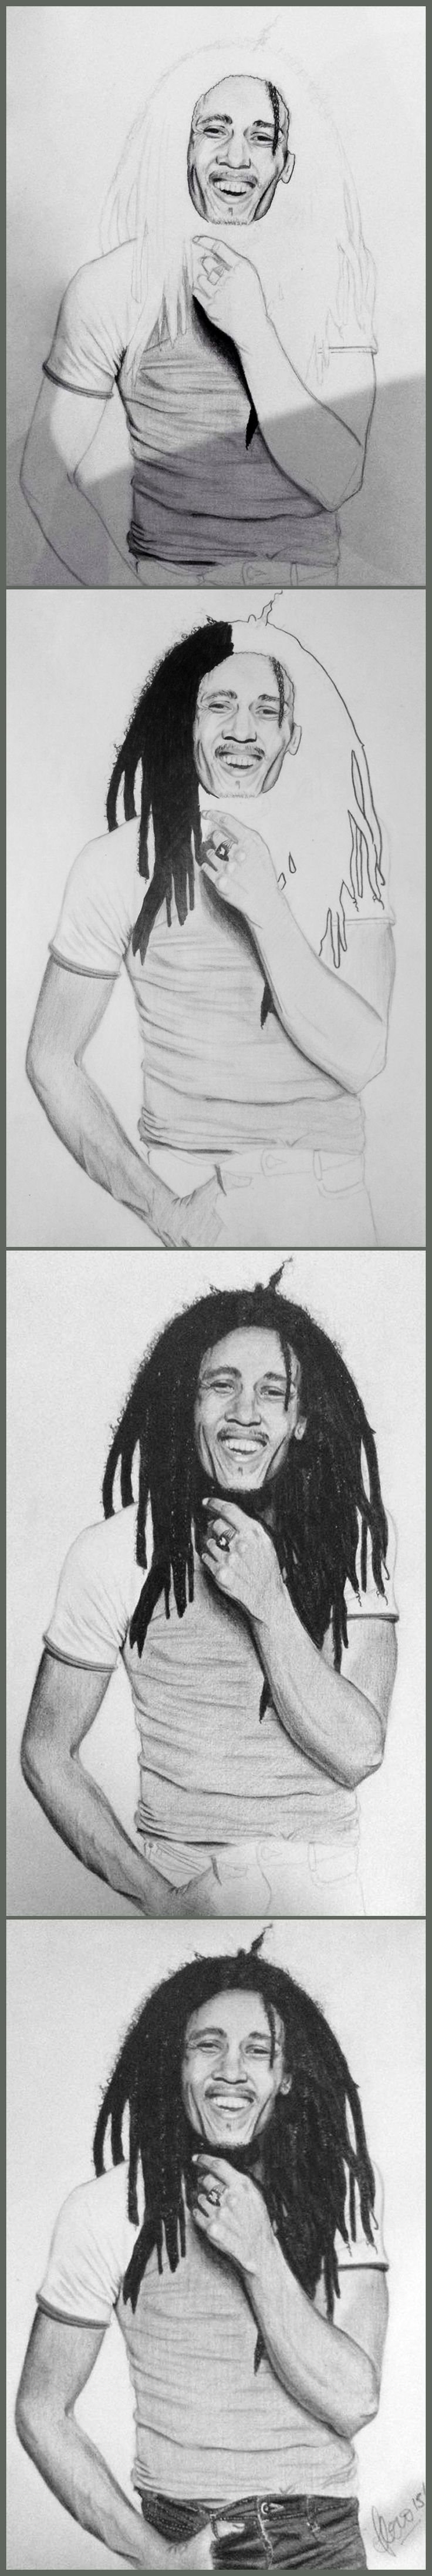 Proceso Bob Marley #art #grafito #Marley #floroperlini #dibujo #arte #music #floro #perlini #illustration #sketch #blackandwhite #blancoynegro #reggae #process #stepbystep